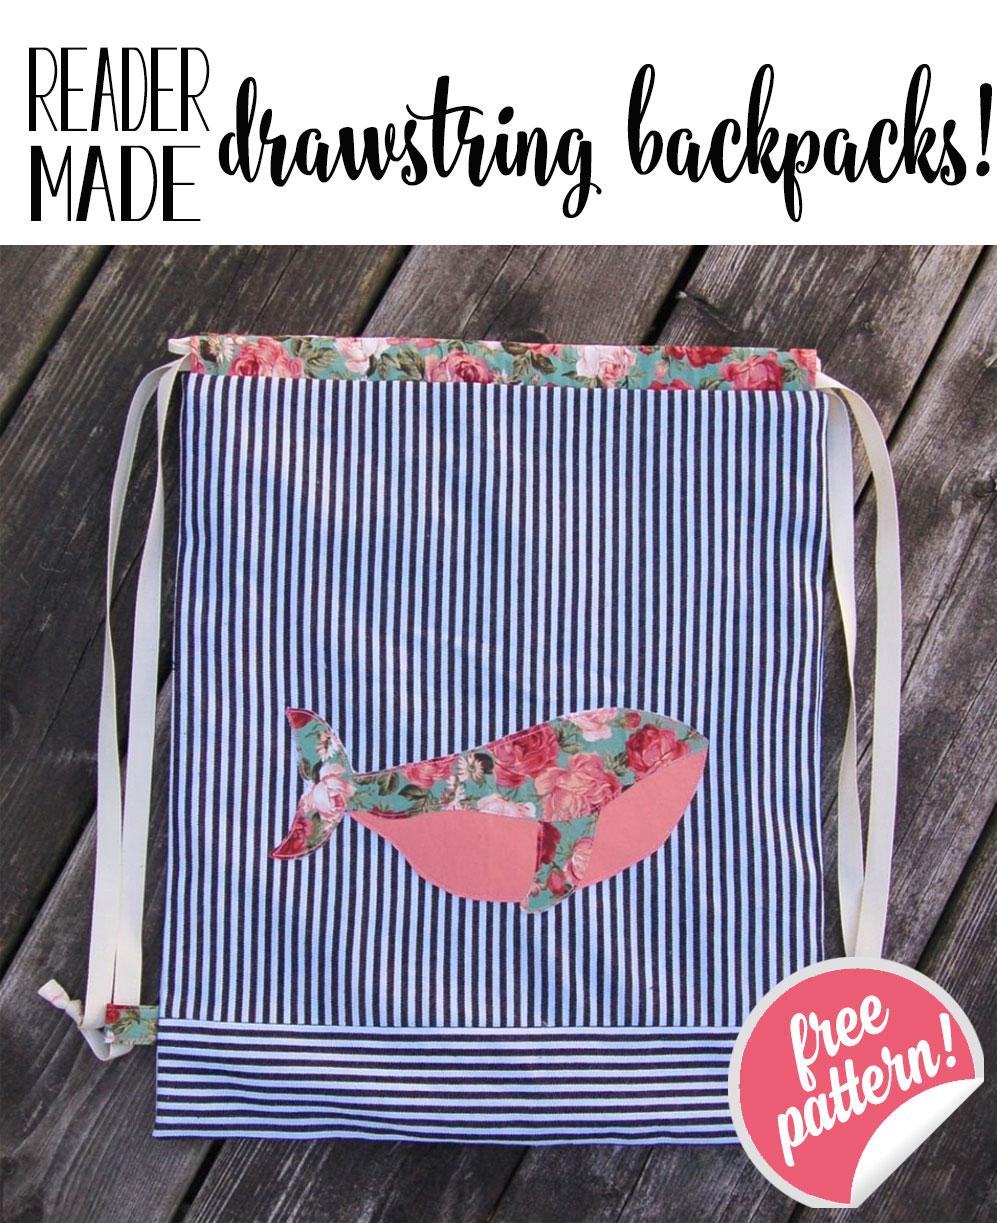 reader-made-drawstring-backpack.jpg